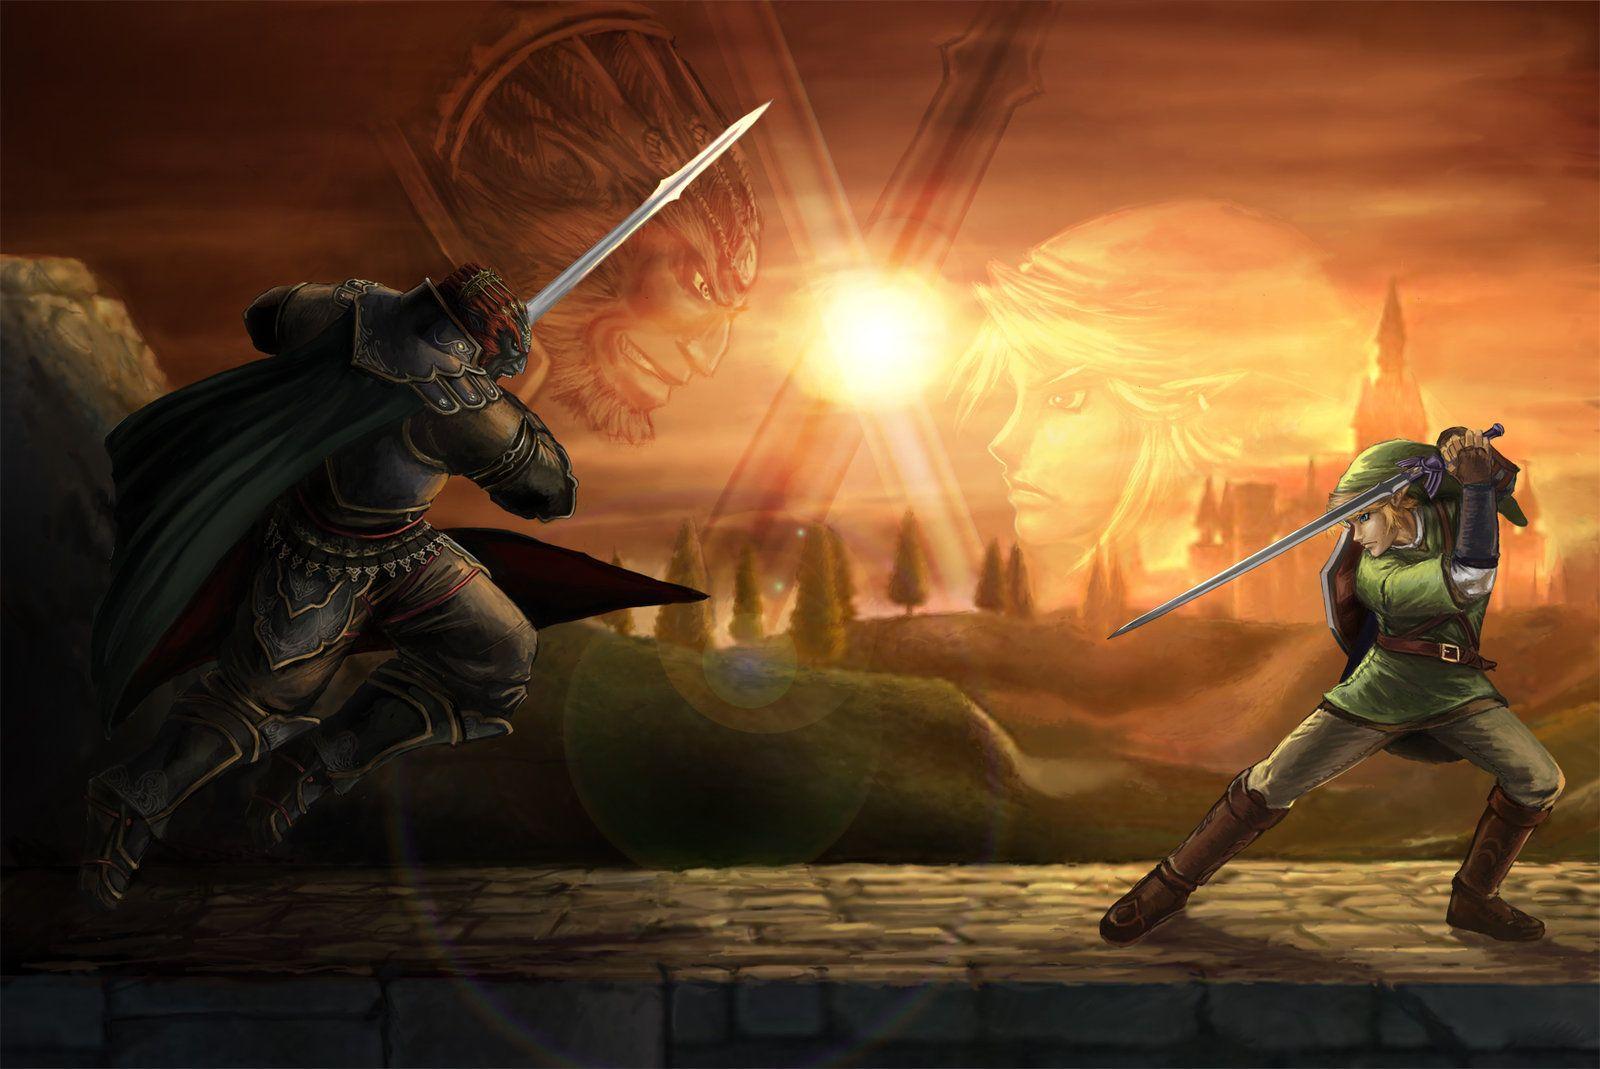 Link Vs Ganondorf By Yamao On Deviantart Legend Of Zelda